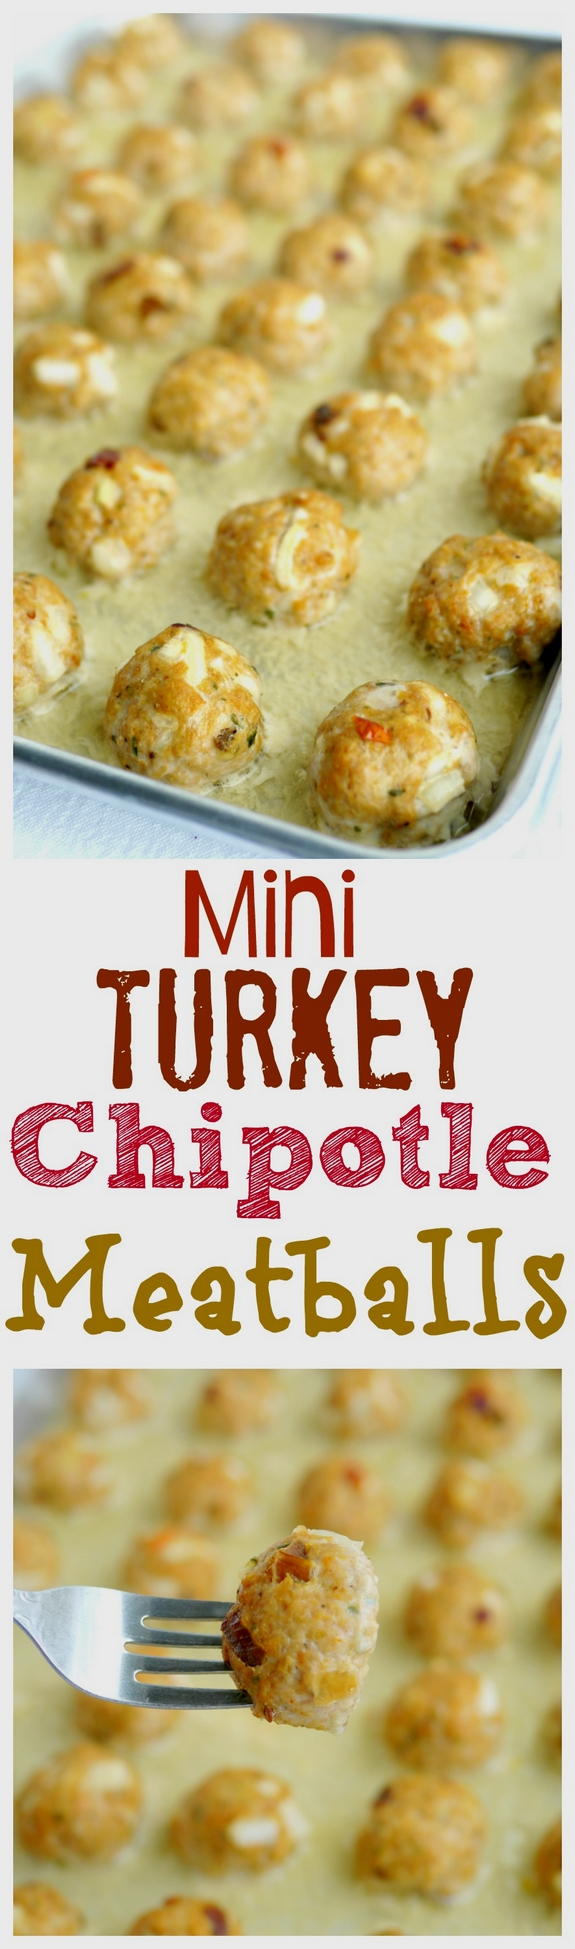 Mini Turkey Chipotle Meatballs | Noble Pig